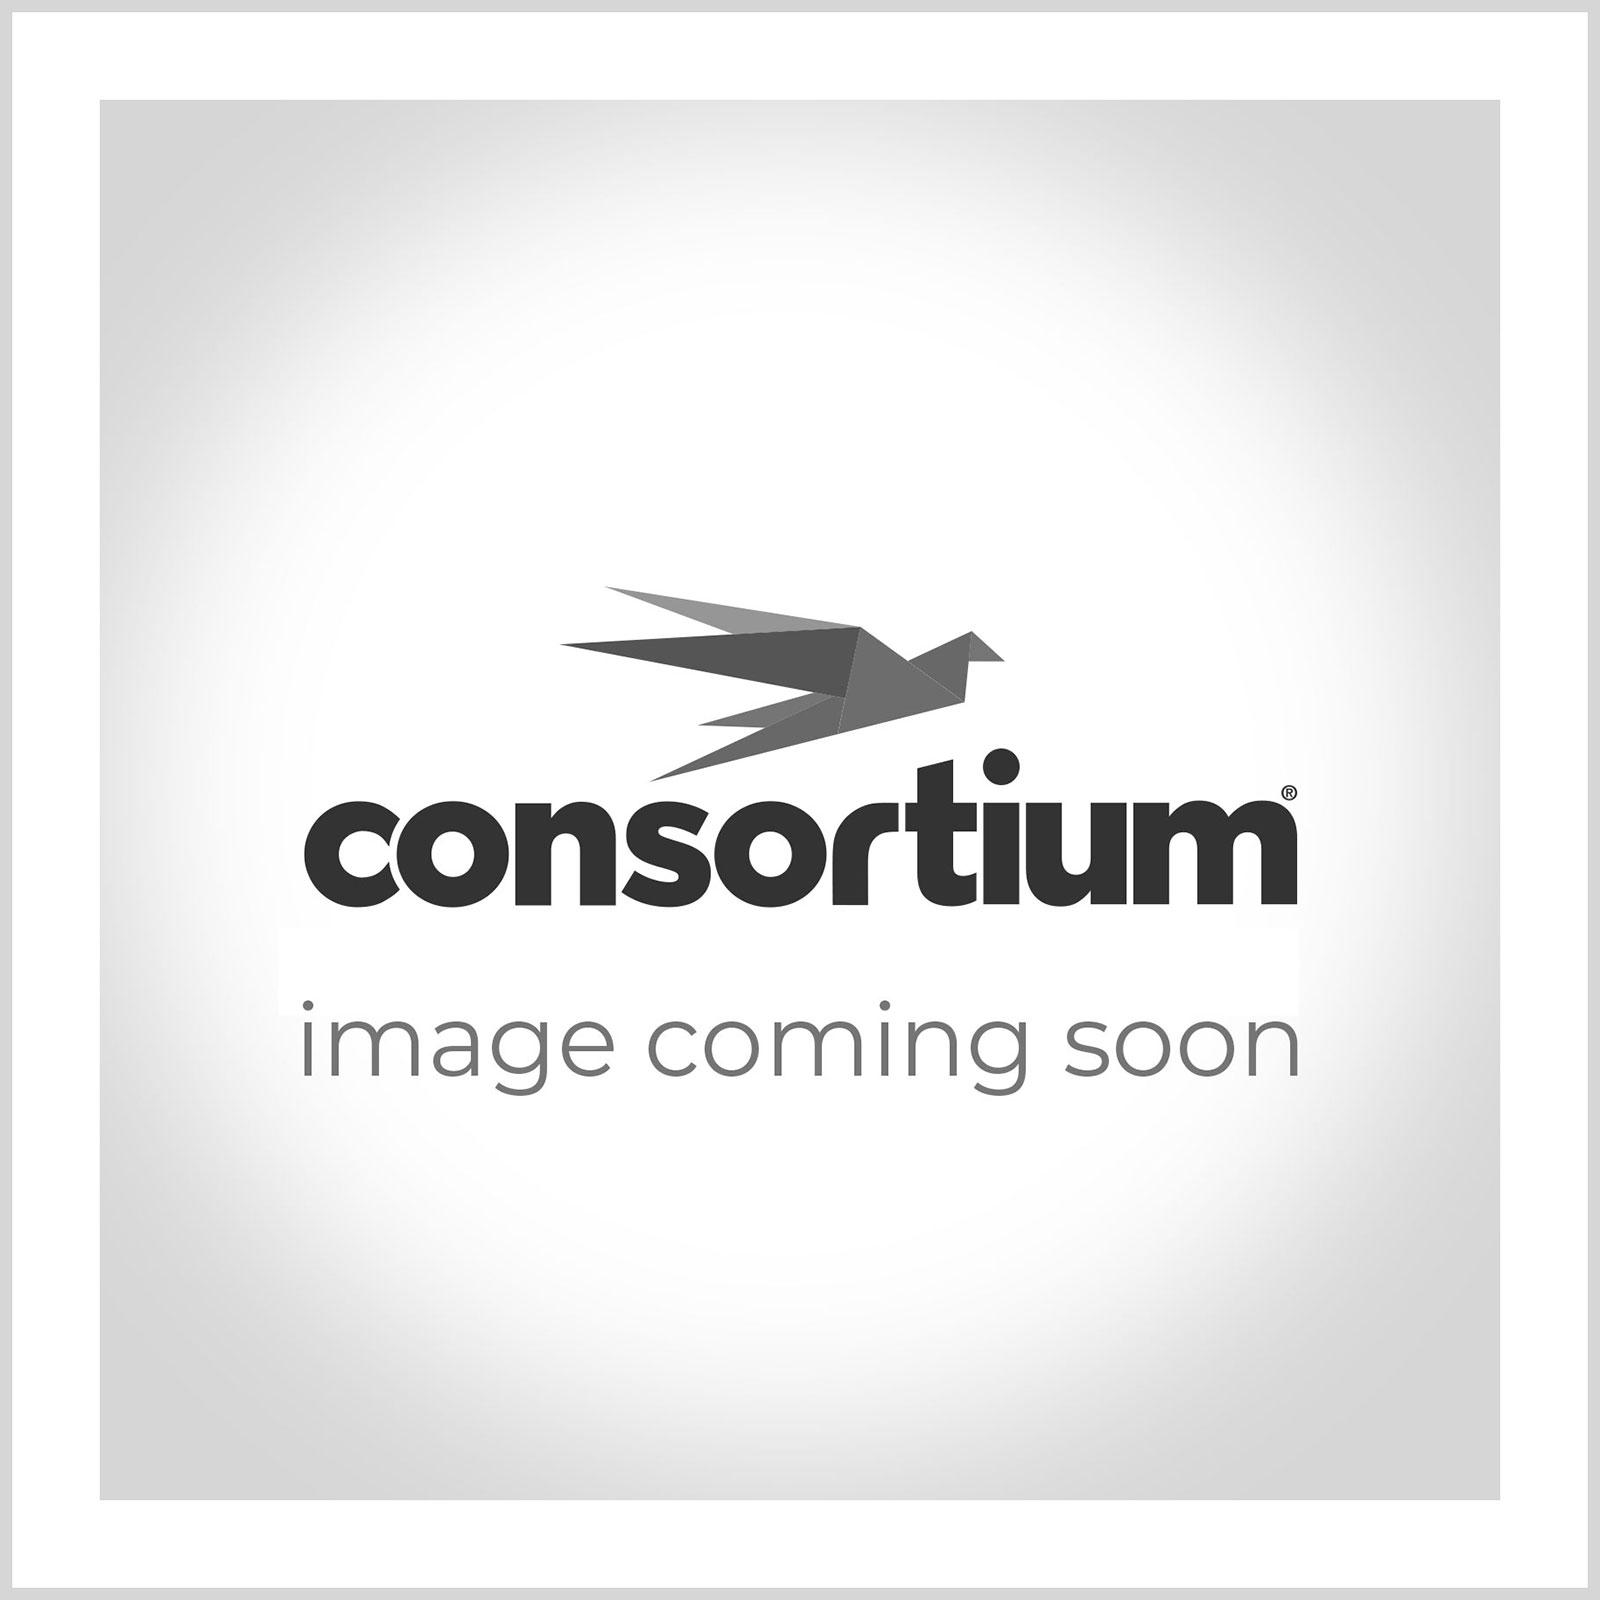 Consortium Popper Wallets